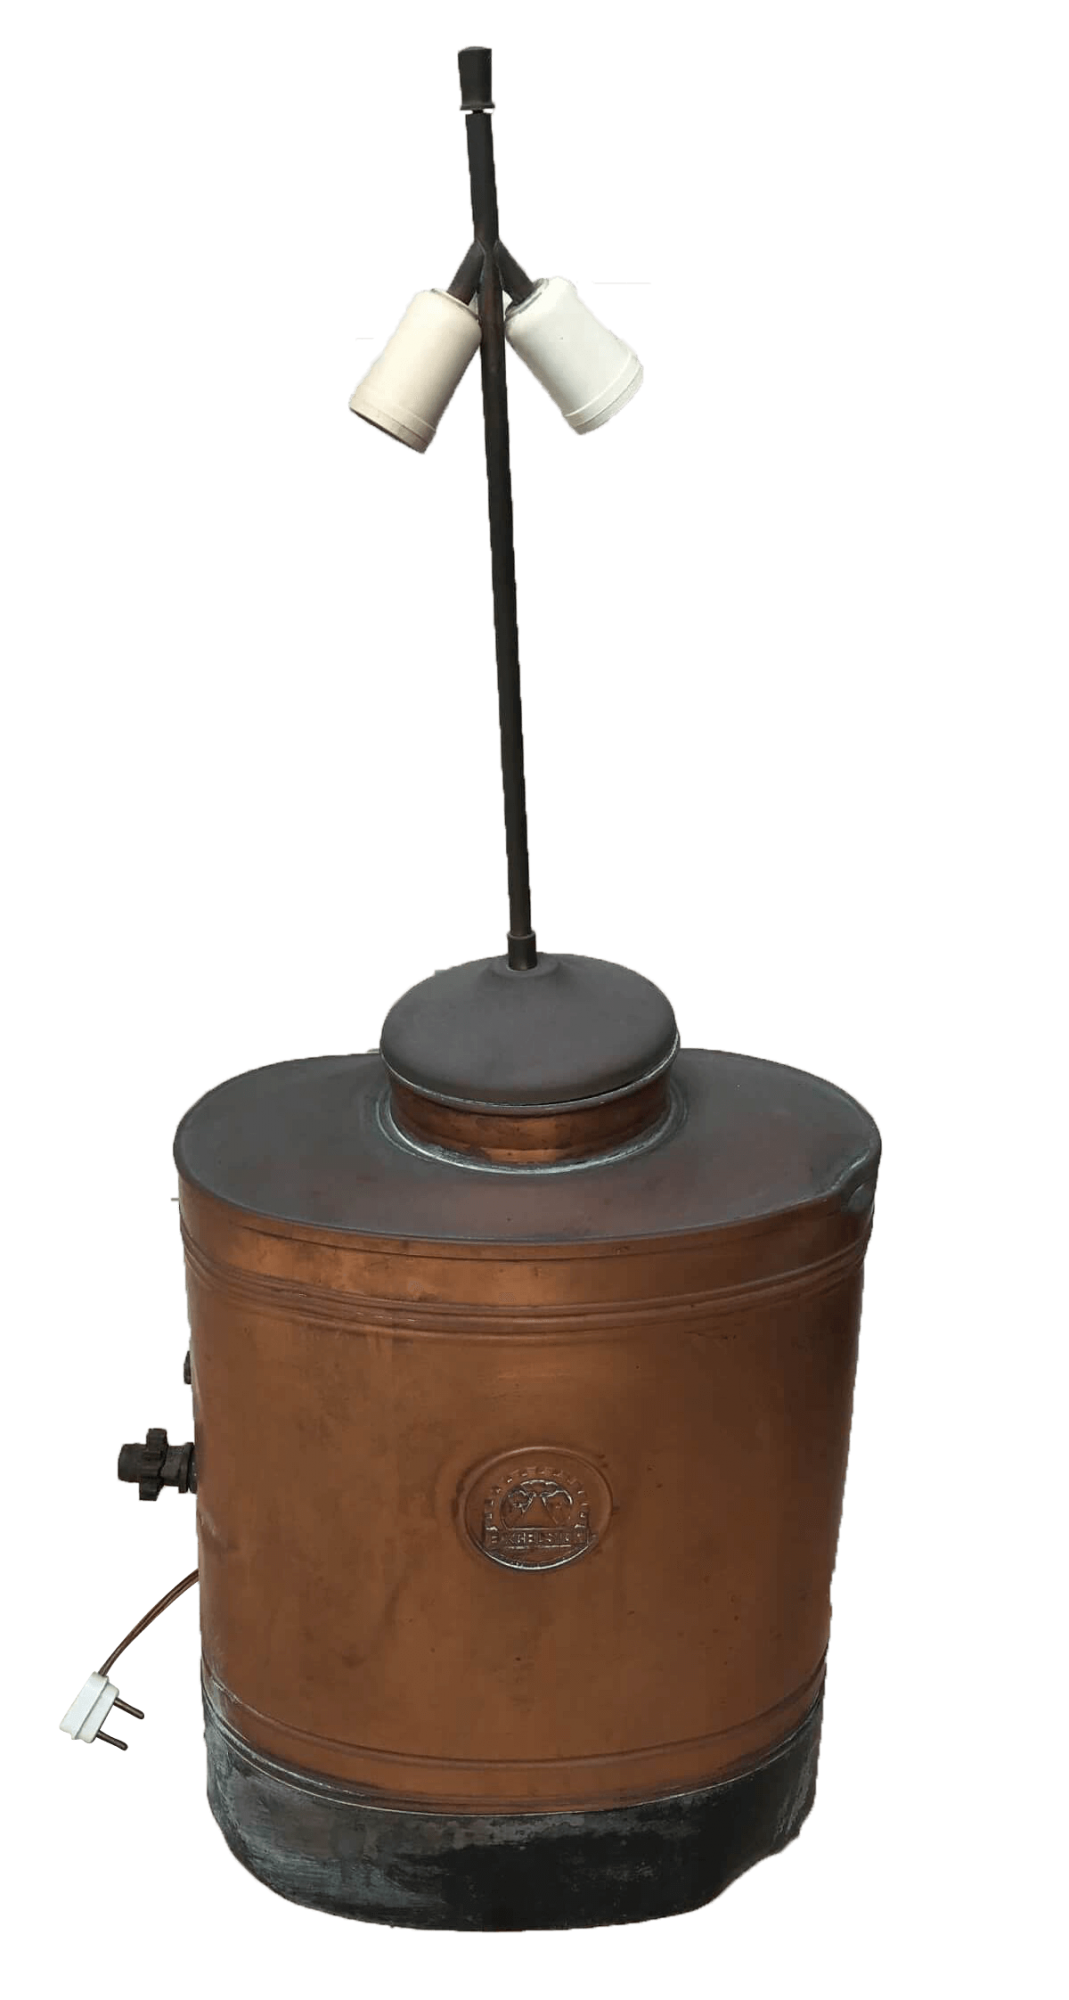 Pulverizador Antigo De Cobre Excelsior Adaptado Abajur